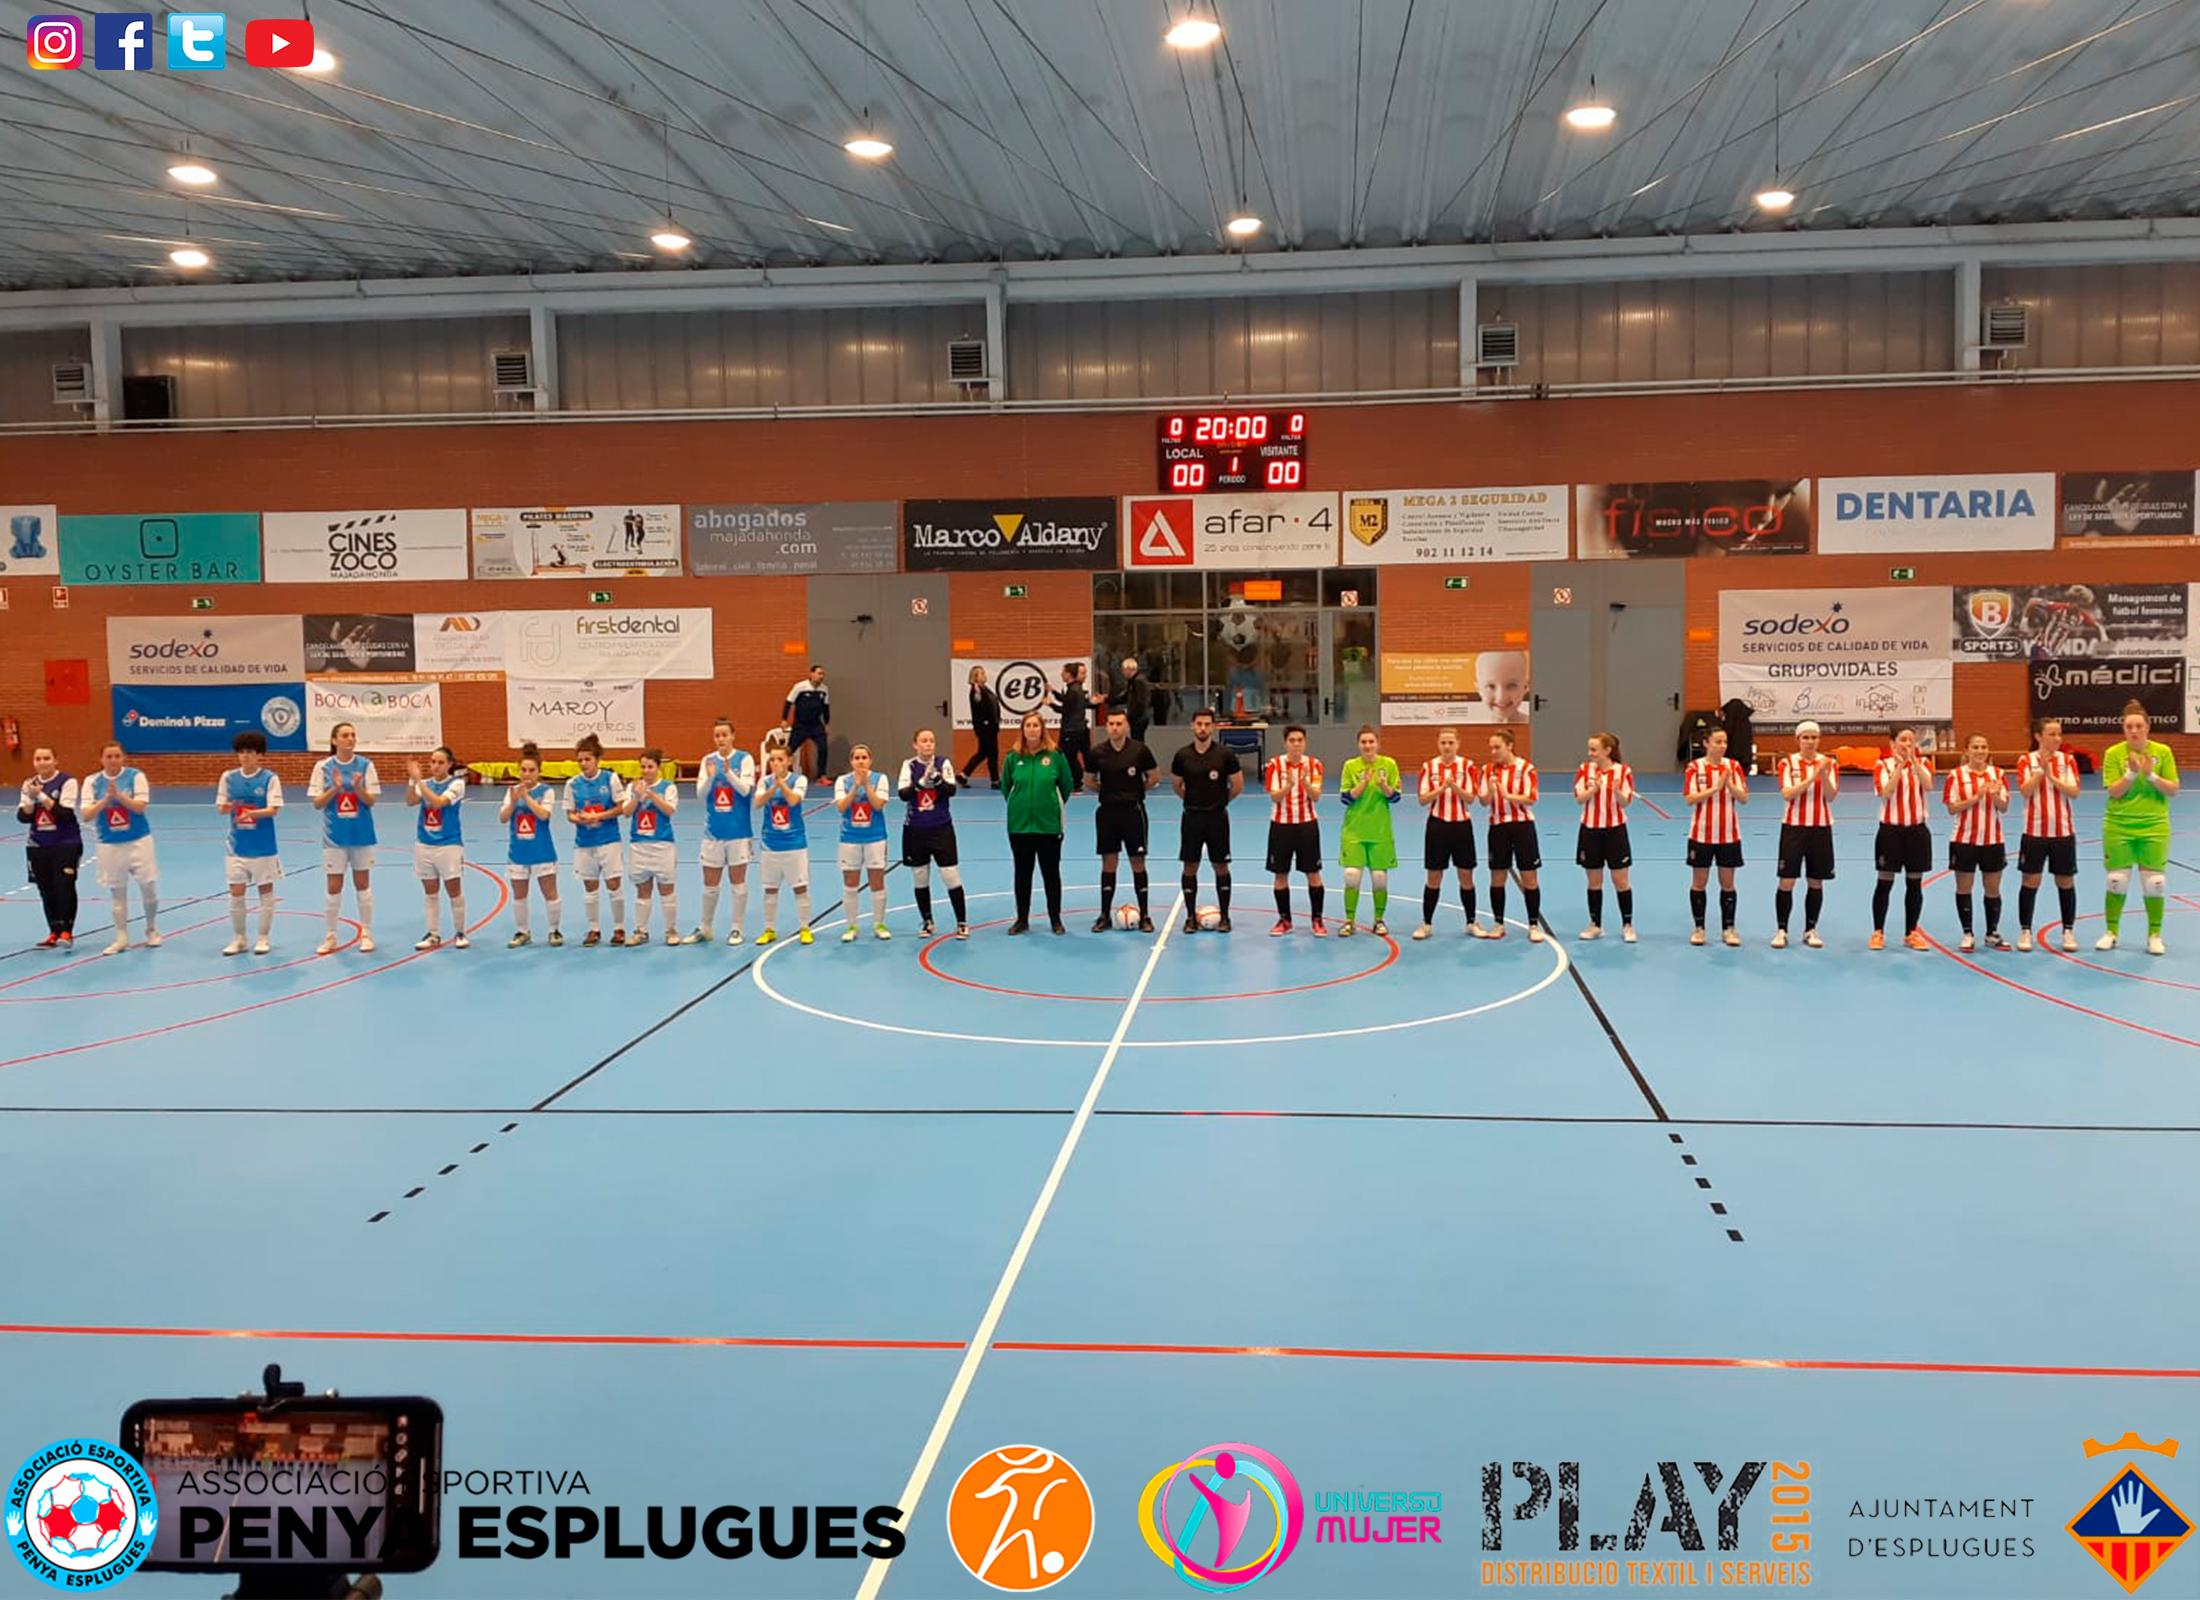 Crónica: FS Majadahonda - AE Penya Esplugues. Jornada 20ª. 1ª División de Fútbol Sala Femenino